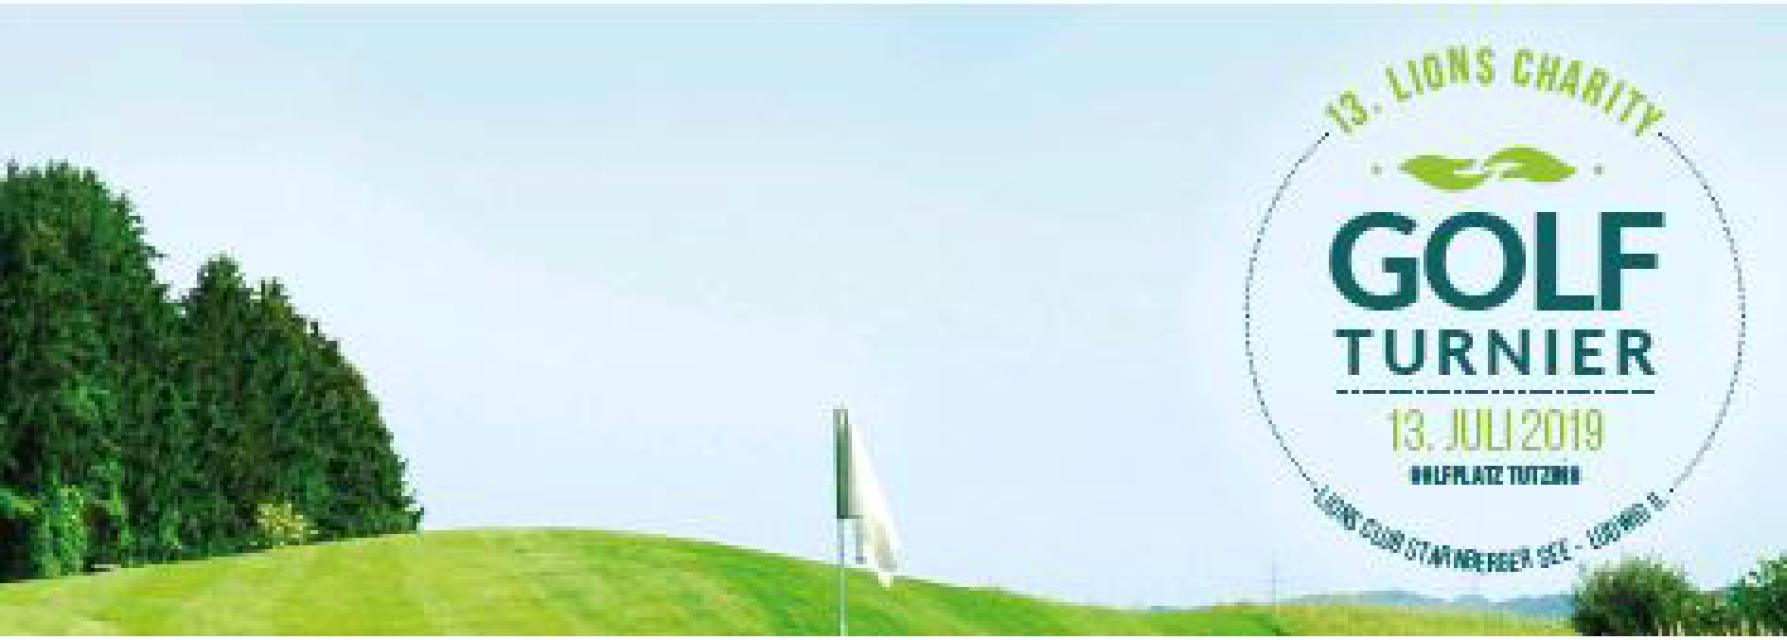 Charity Golfturnier des Lions Club Starnberger See